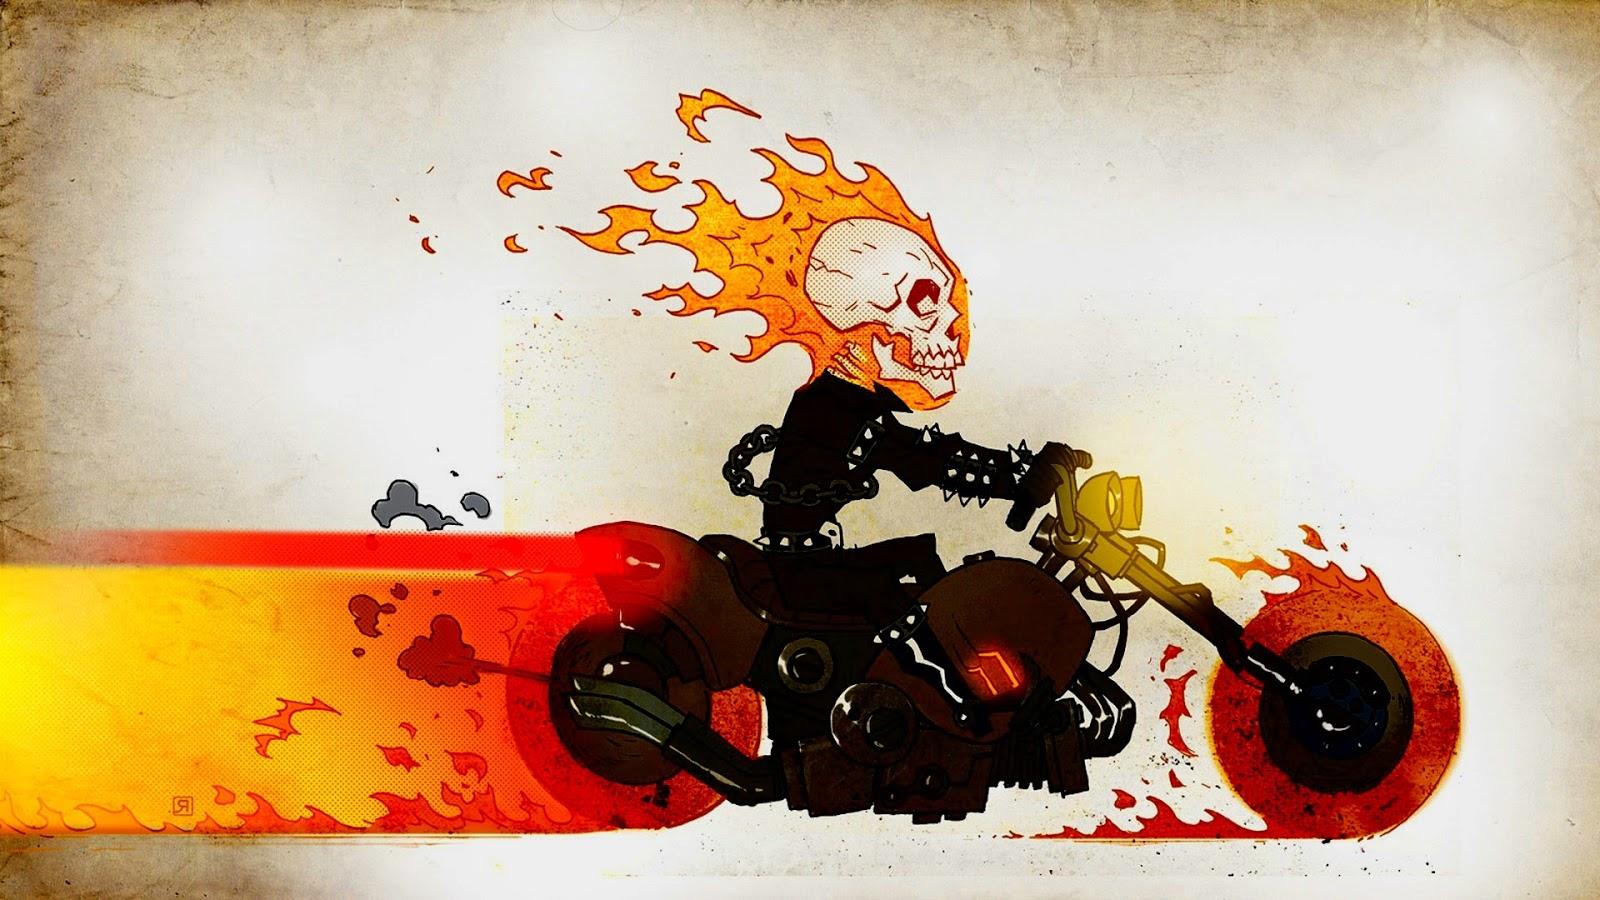 Download   Wallpaper Horse Ghost Rider - 22  HD_796514.jpg